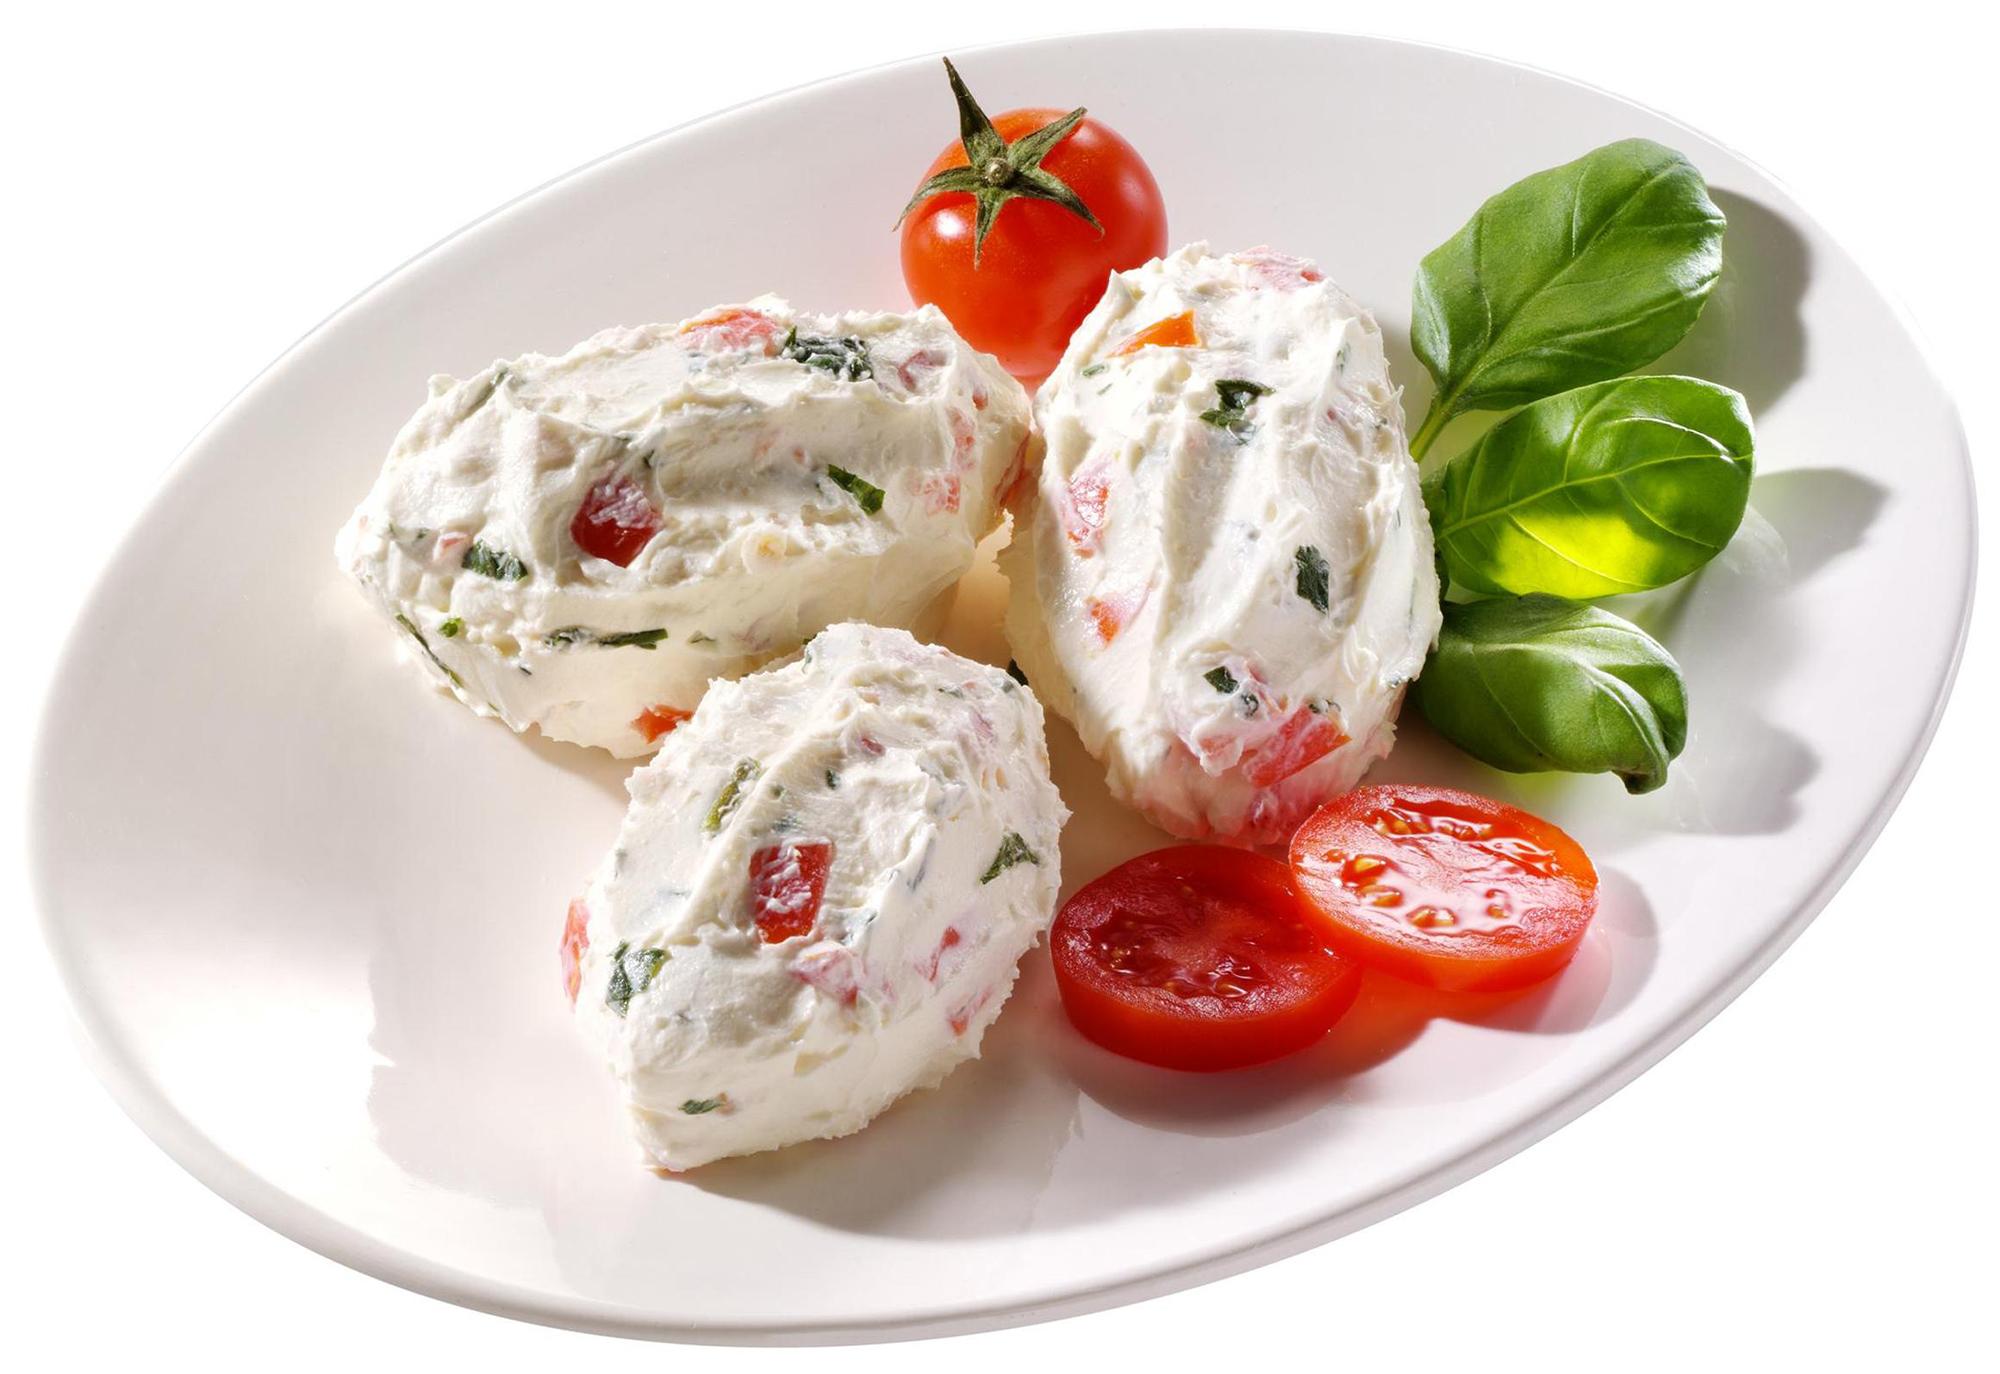 Tomaten-Basilikum-Frischkäsecreme